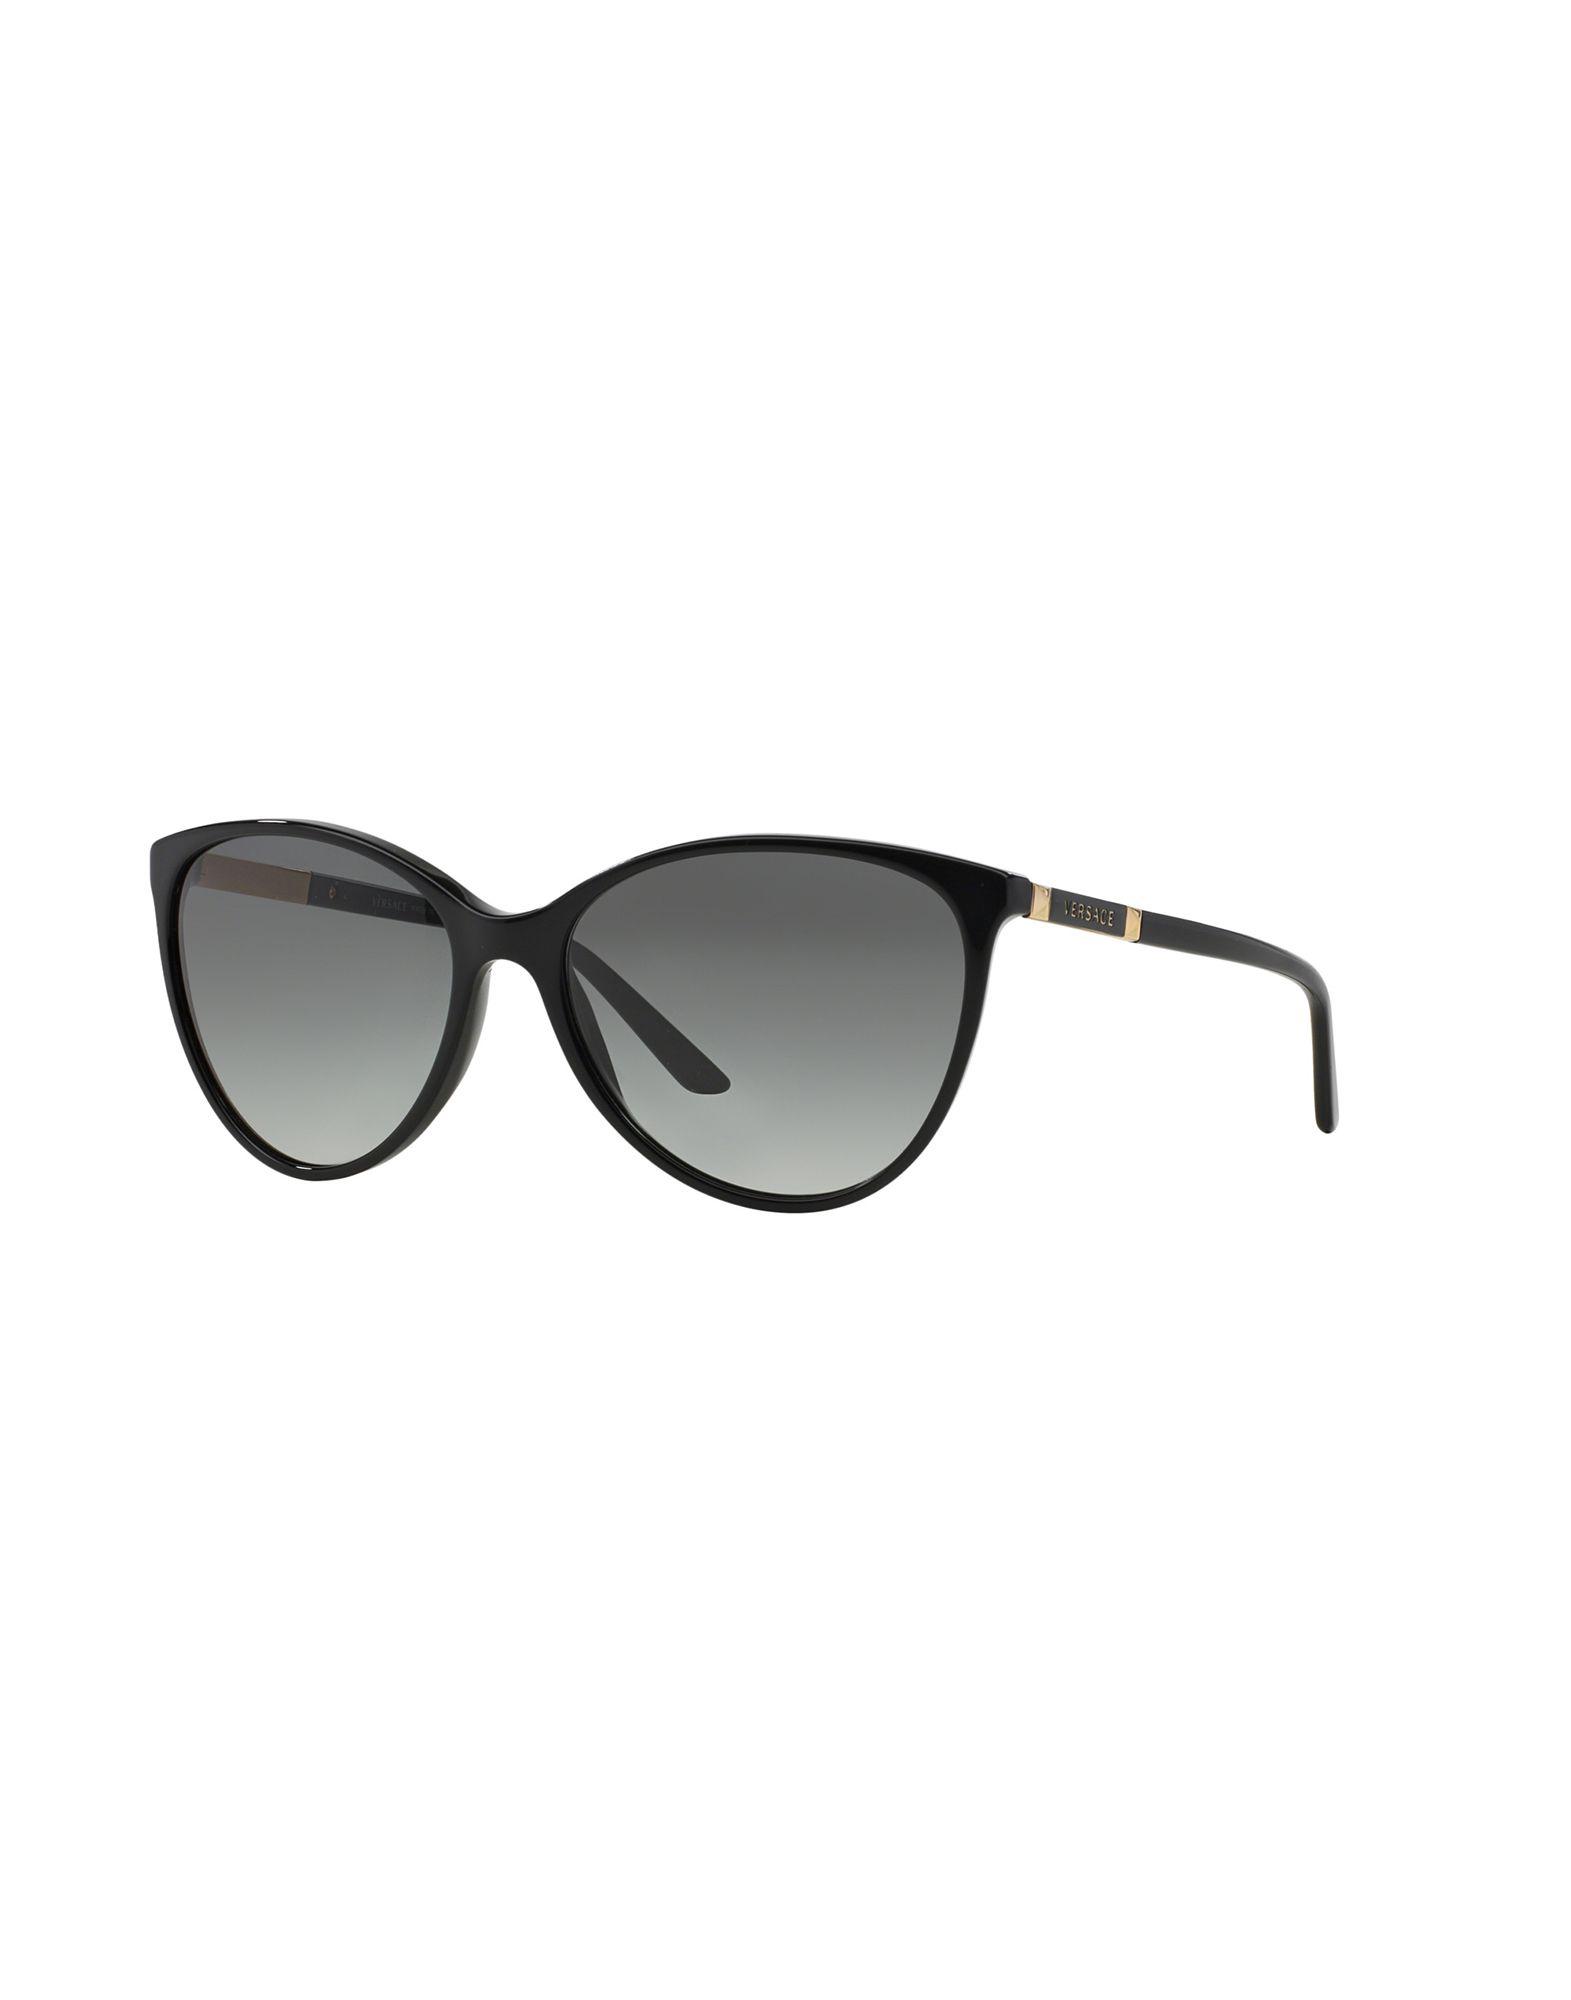 Occhiali Da Sole Versace Ve4260 - Donna - Acquista online su